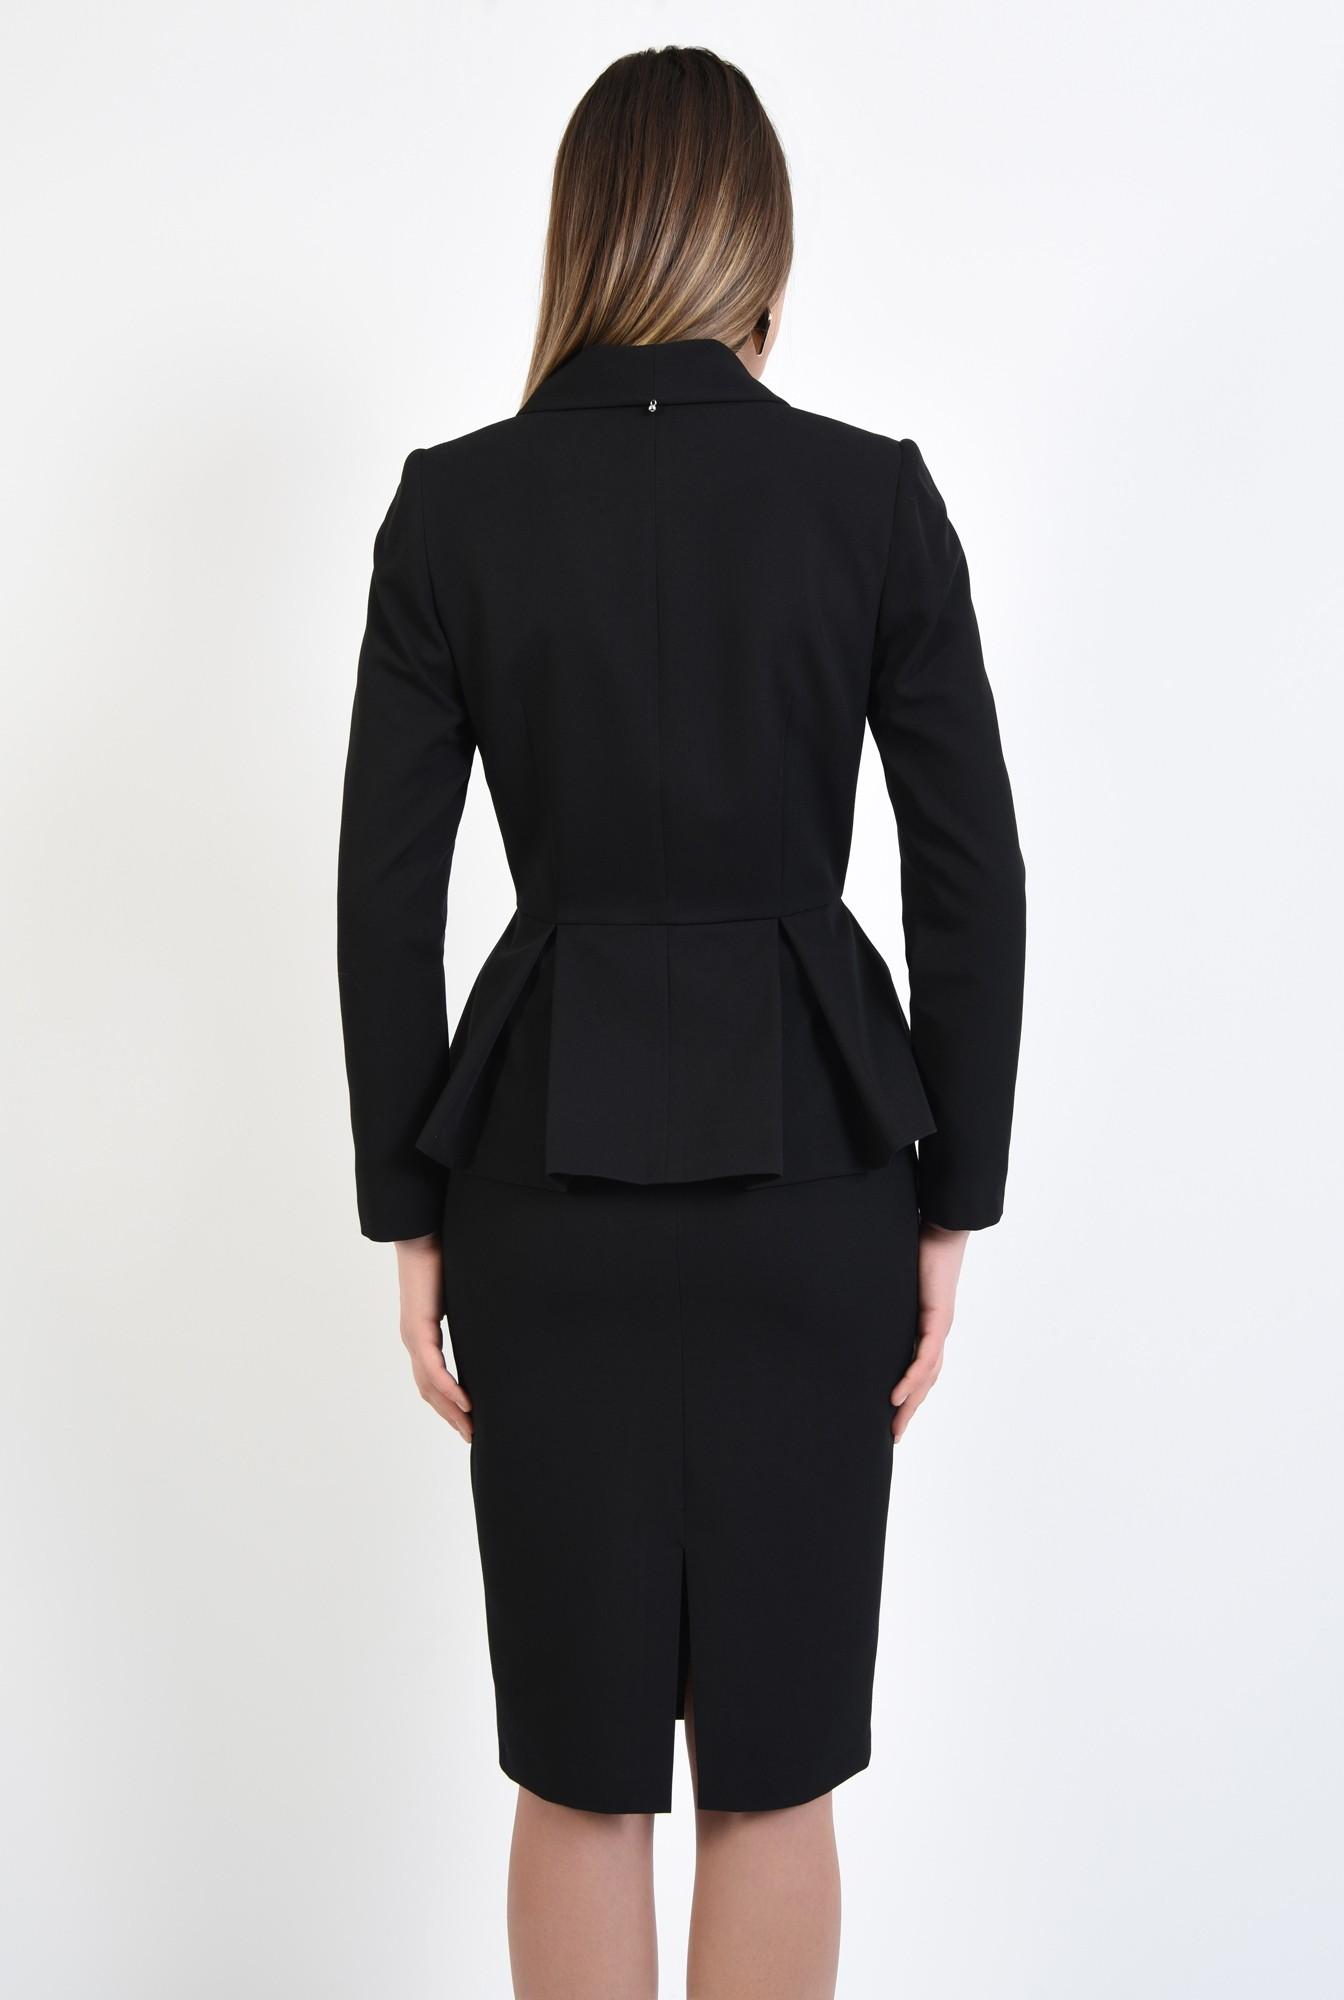 1 - 360 - blazer elegant, cu volan si pliuri, cu nasturi, revere rotunjite